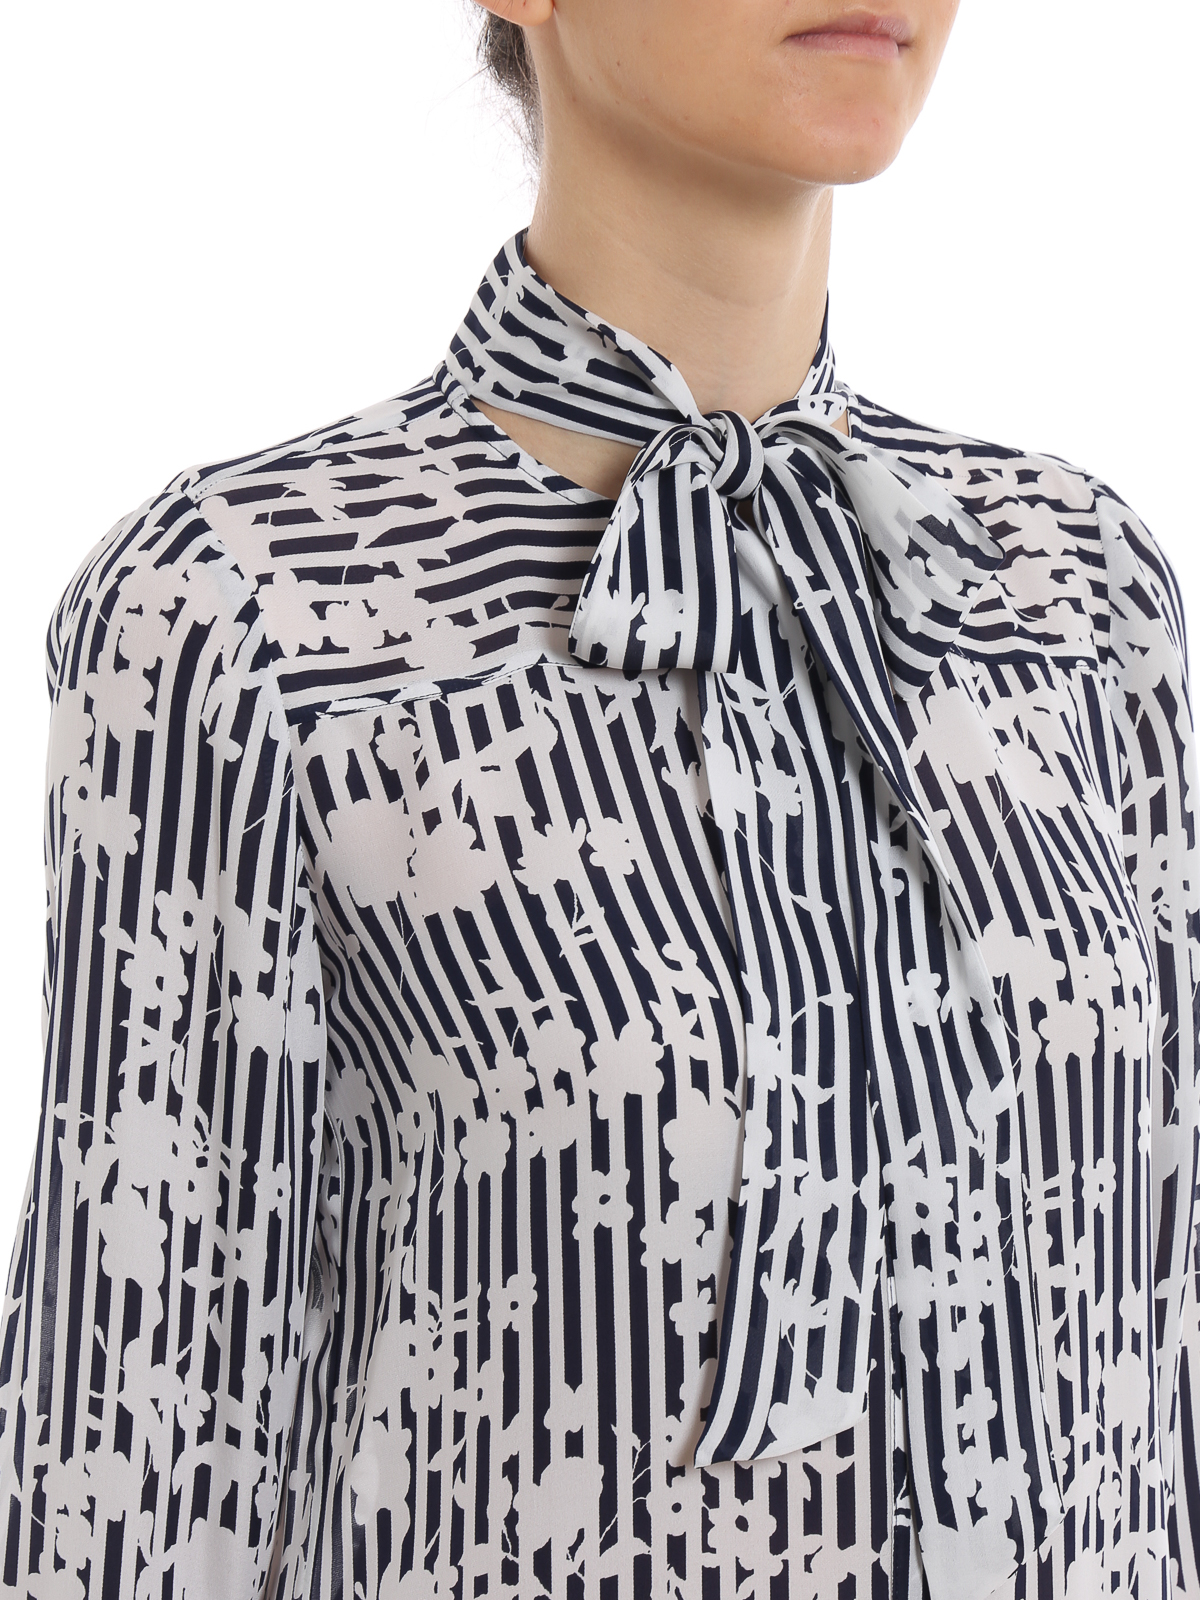 e38556475 MICHAEL KORS buy online Vestido Corto - Azul Oscuro · MICHAEL KORS  Vestidos  cortos ...